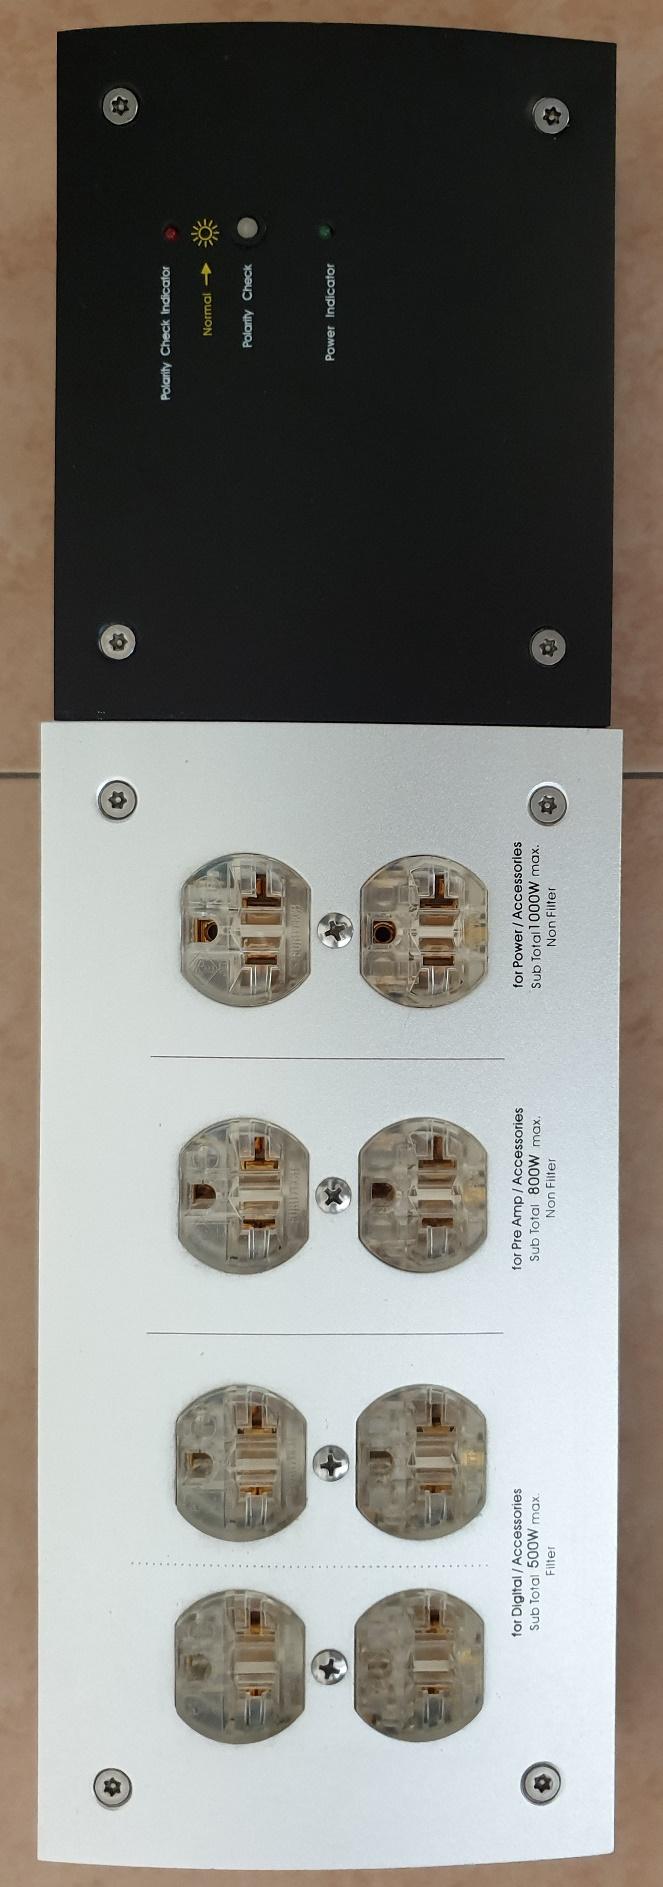 Furutech e-TP80 AC Power Filter Distributor (SOLD) Top_vi10